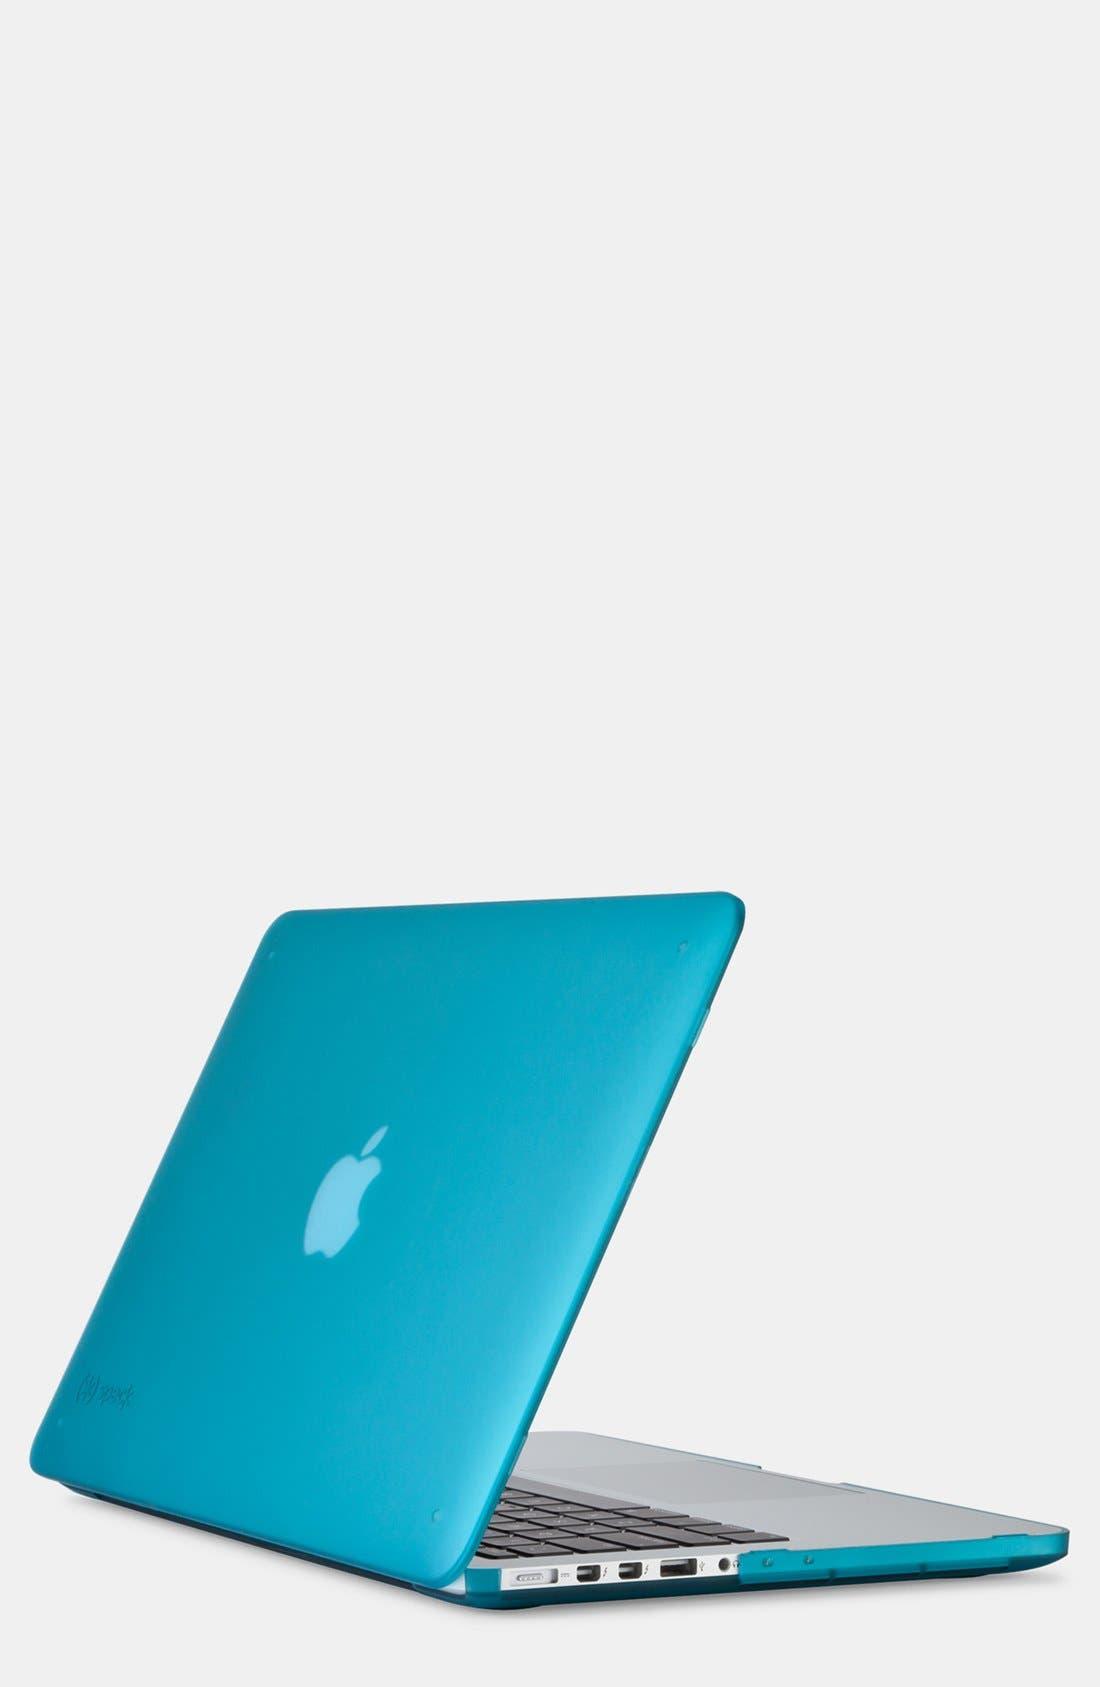 Main Image - Speck 'See Through SATIN' Snap-On MacBook Pro Retina Laptop Case (13 Inch)